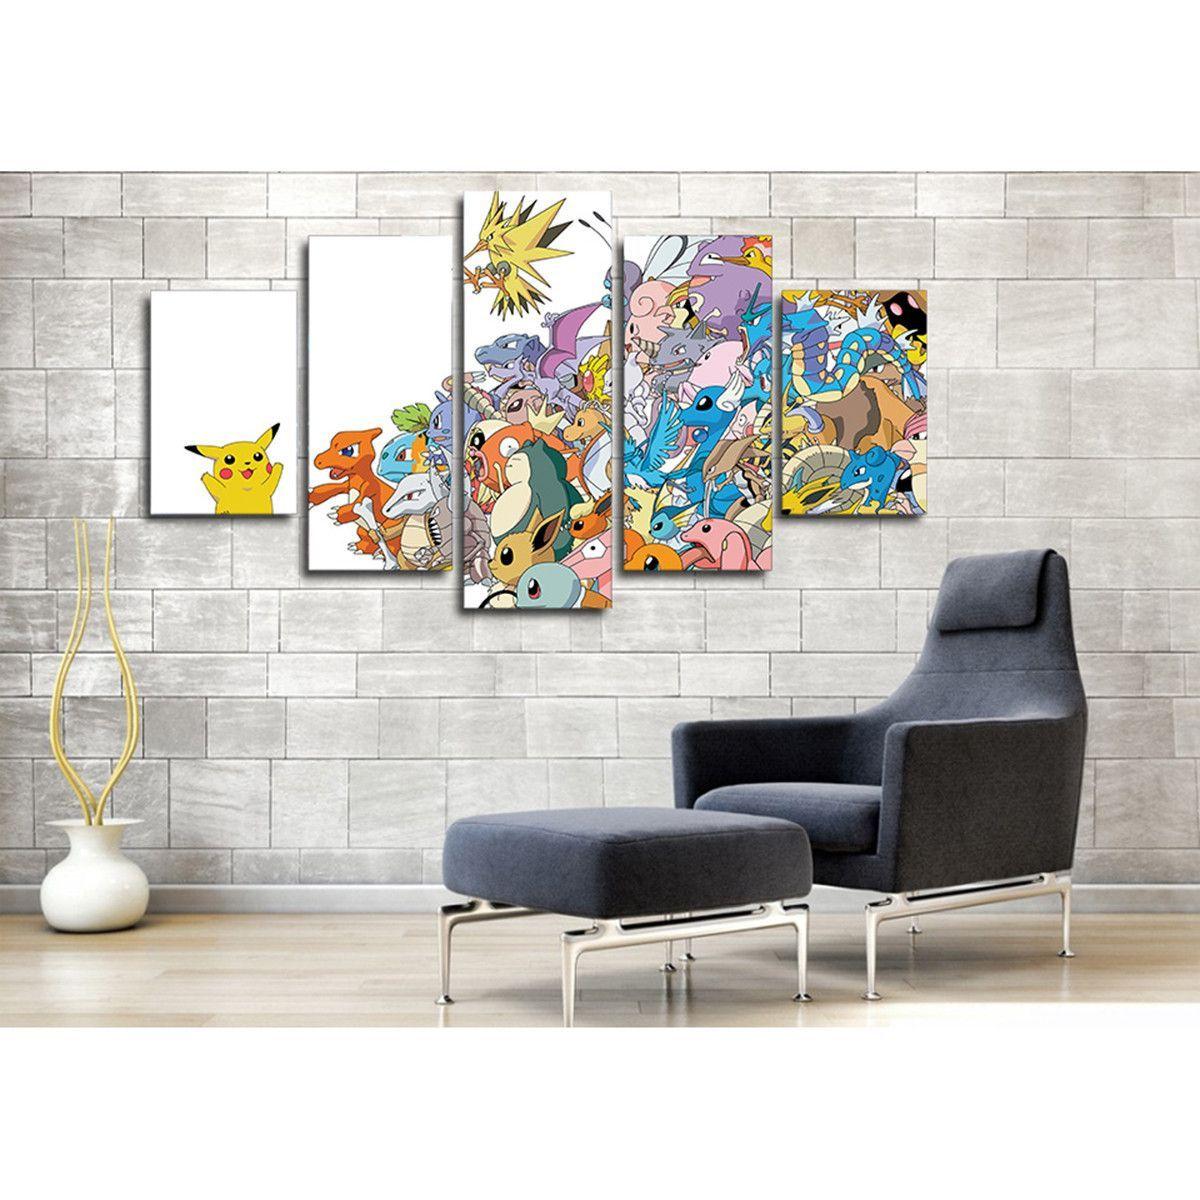 Pokemon 5pcs Large Canvas Print Art Painting Picture Home Decor Wall ...